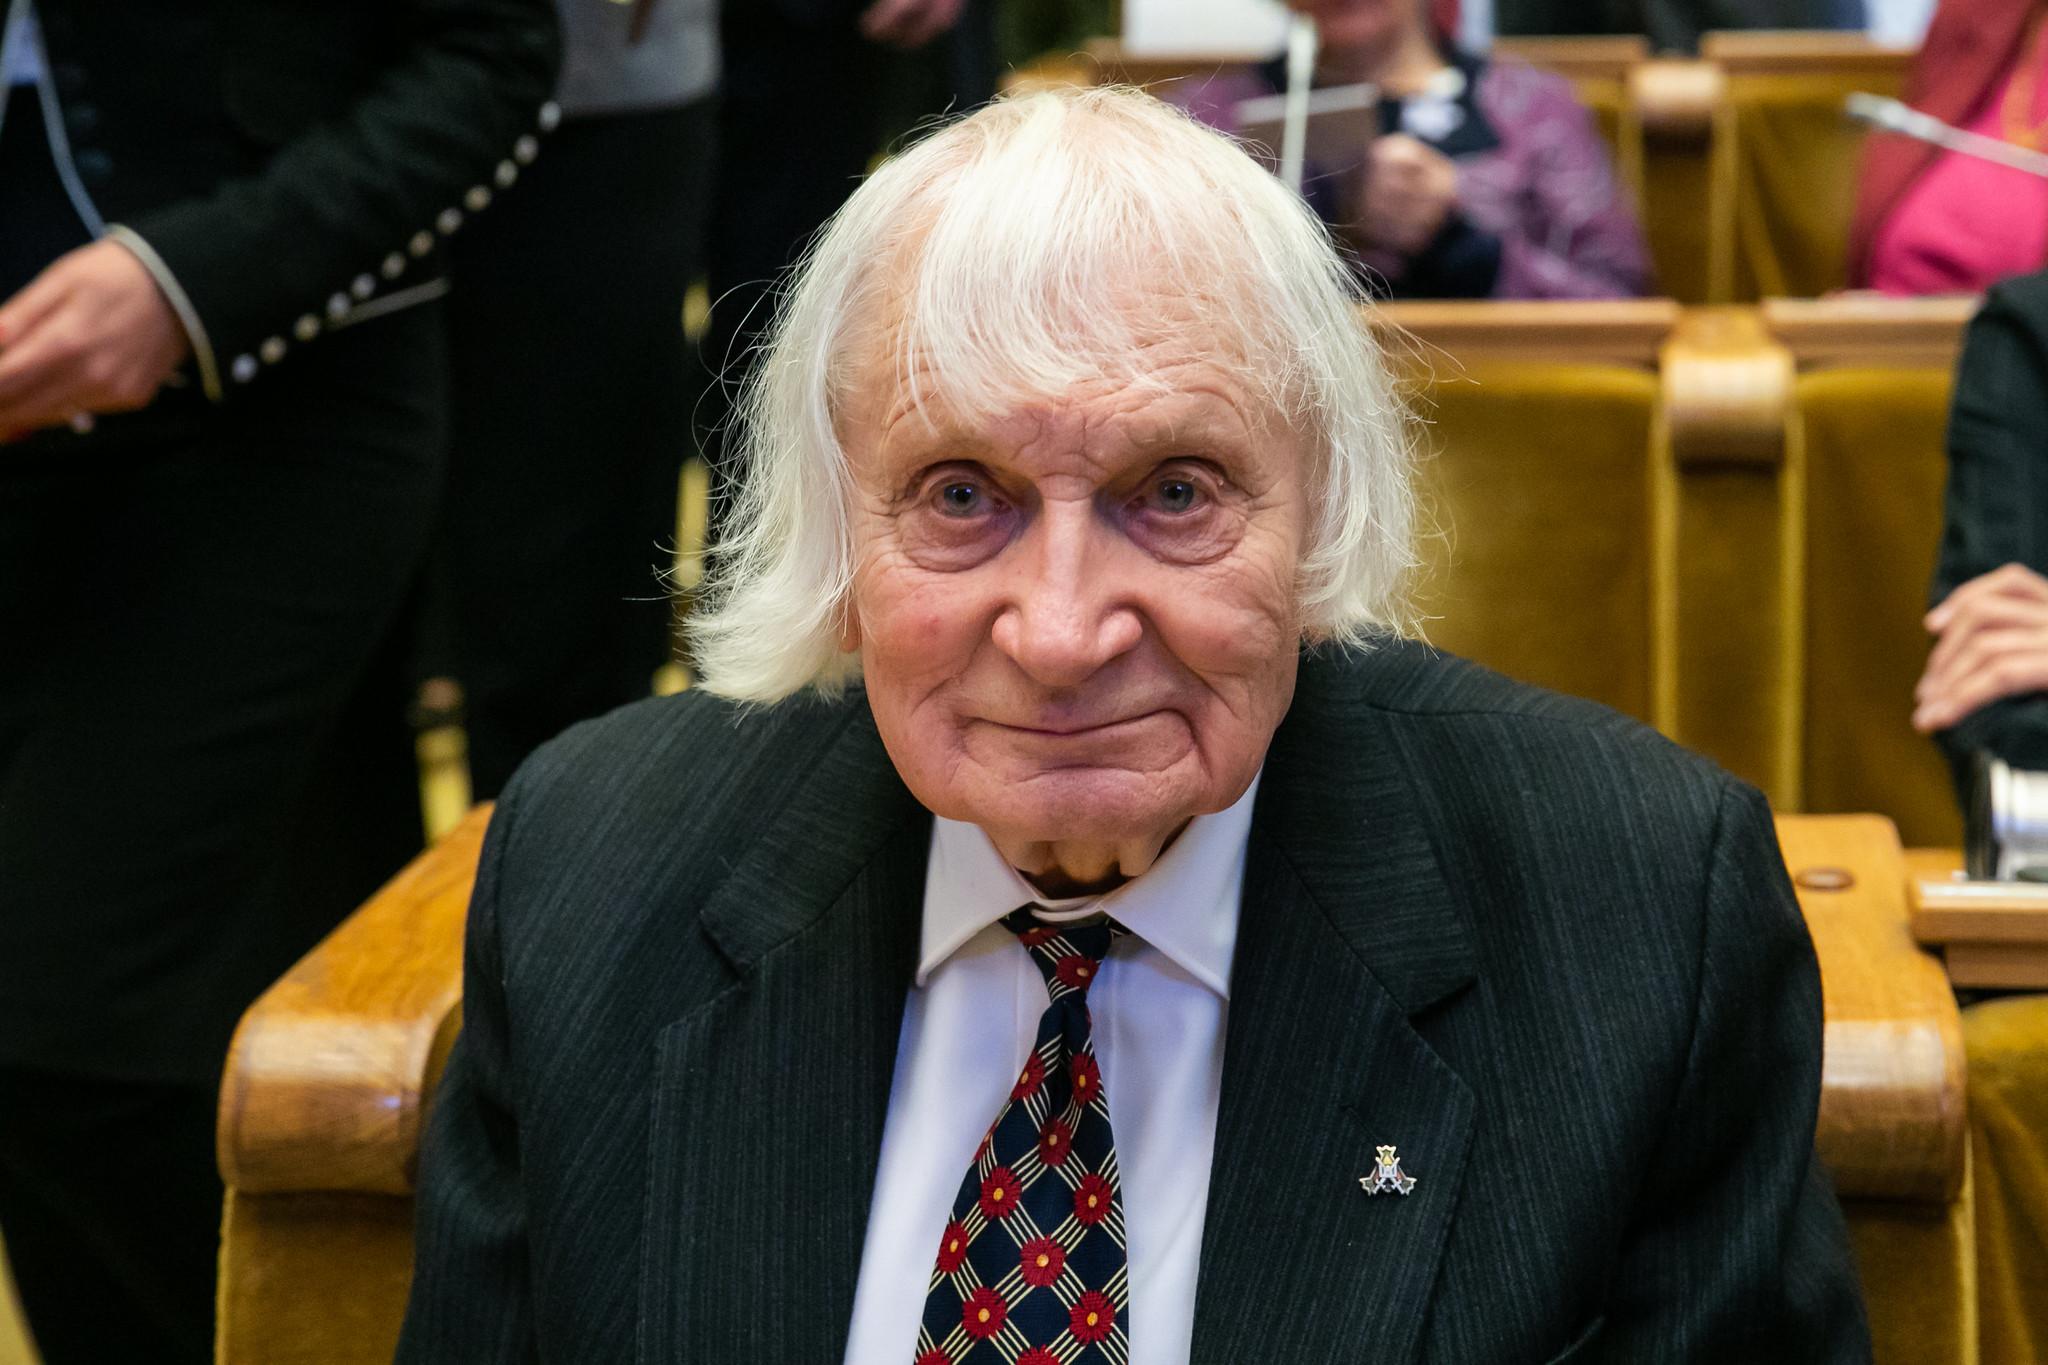 Albinas Kentra | lrs.lt, O. Posaškovos nuotr.